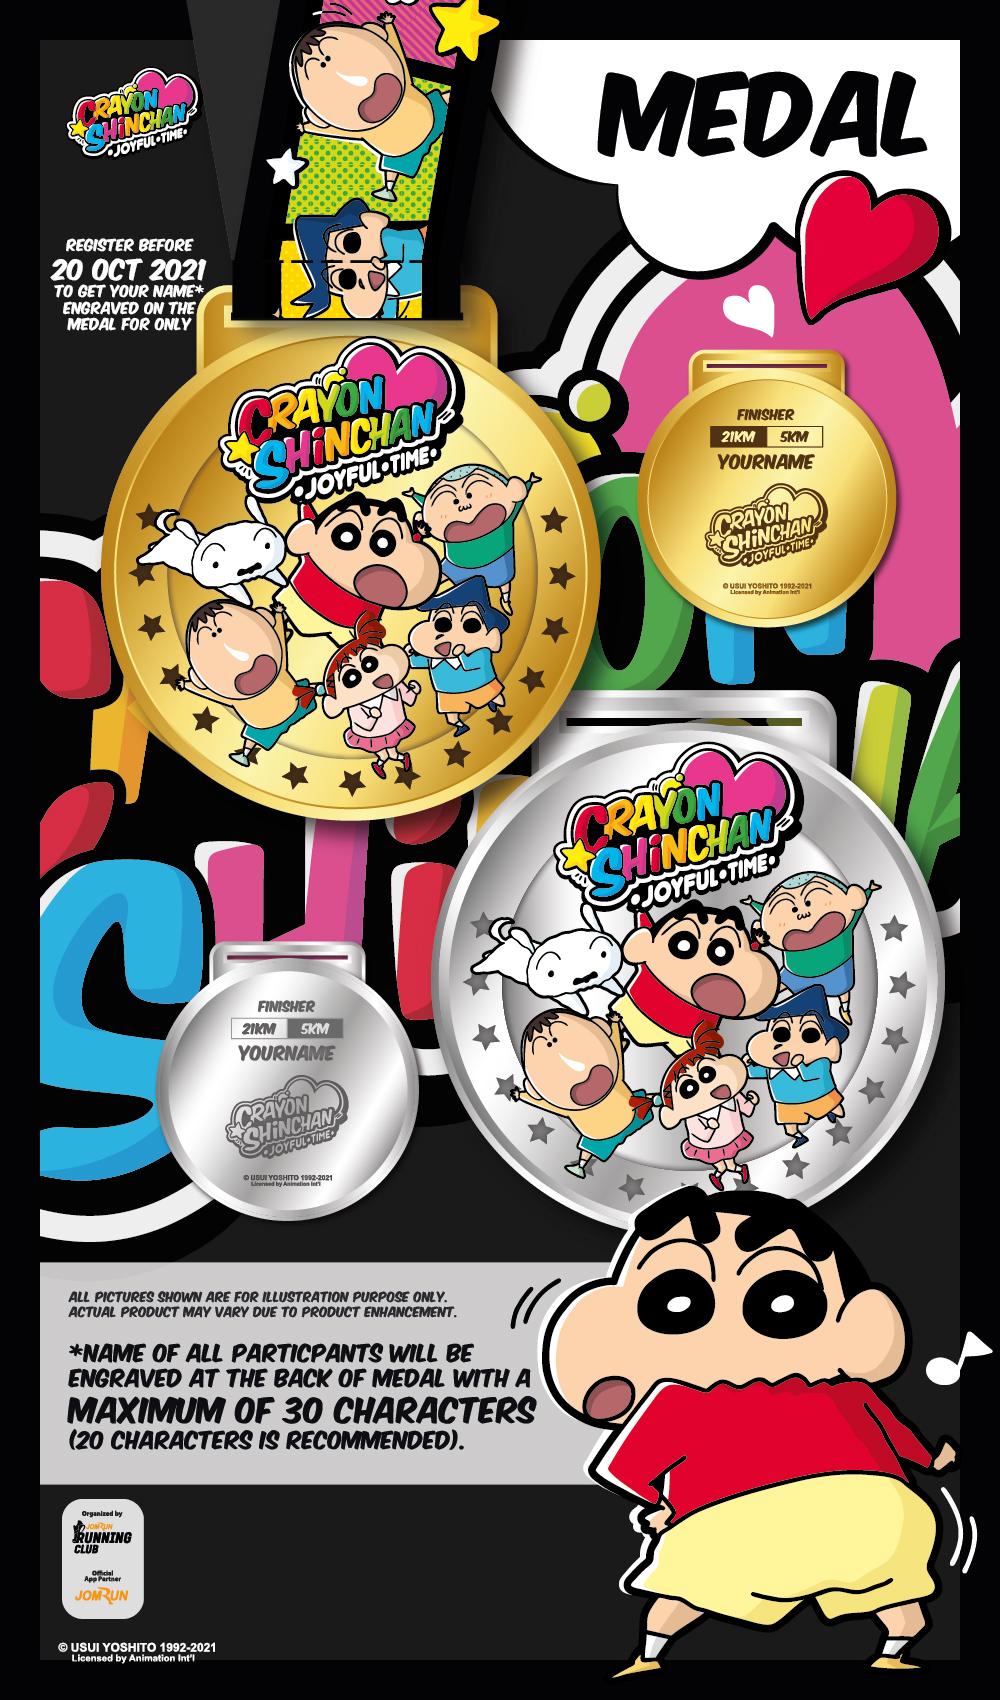 Crayon Shinchan Virtual Run Full Series